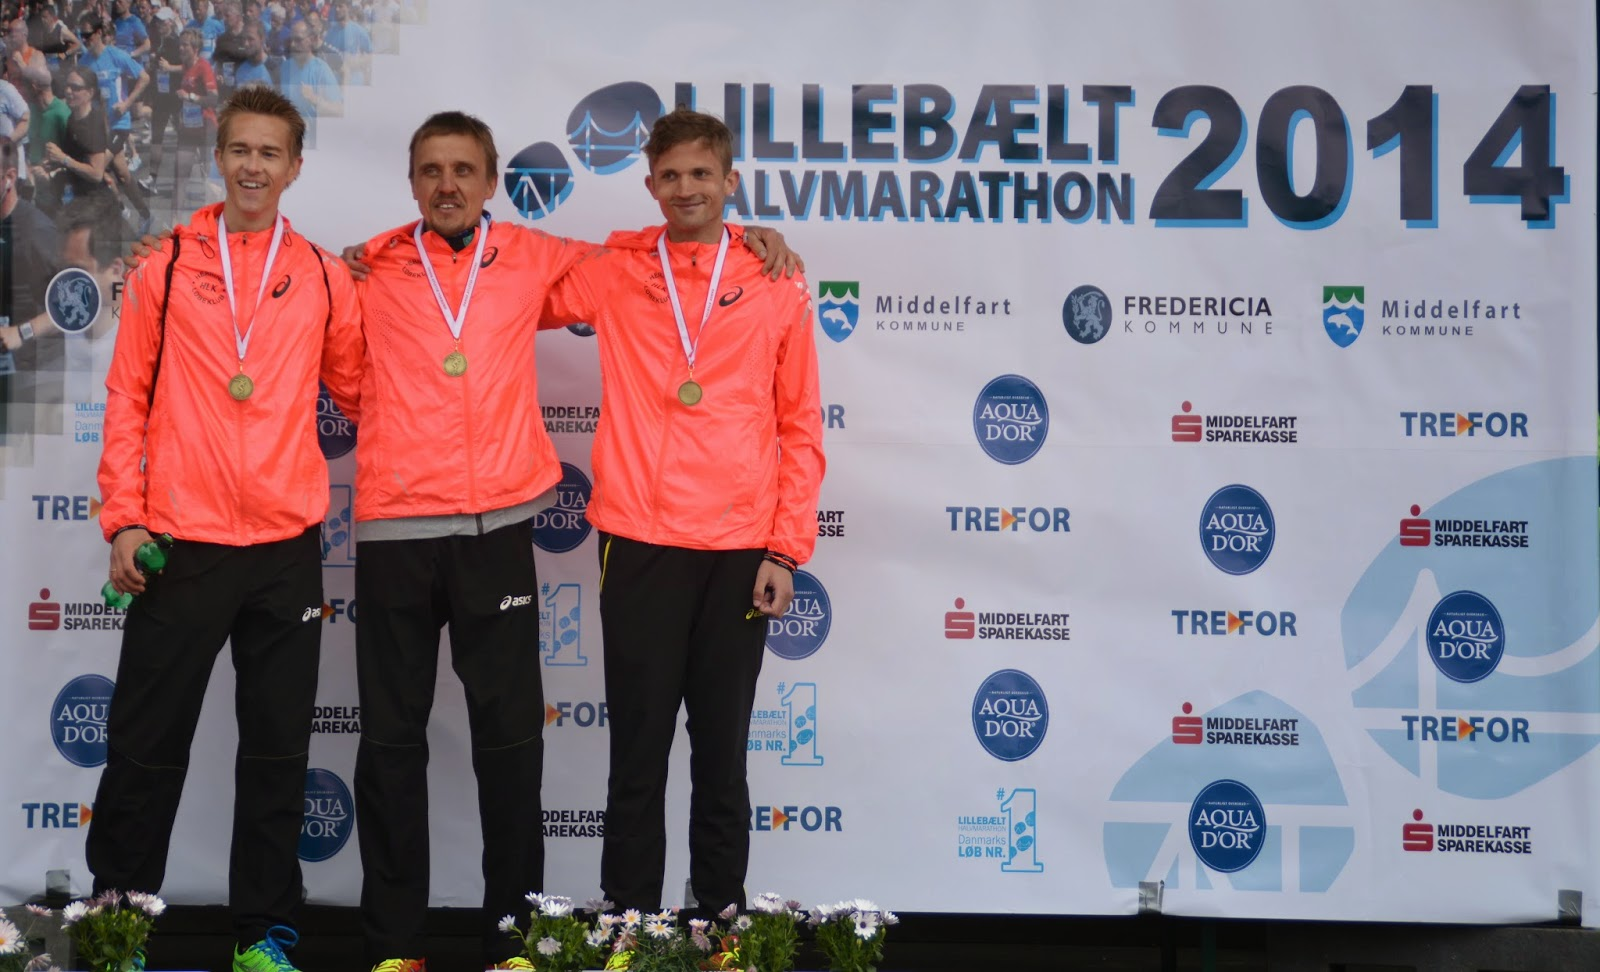 lillebælt halvmarathon 2014